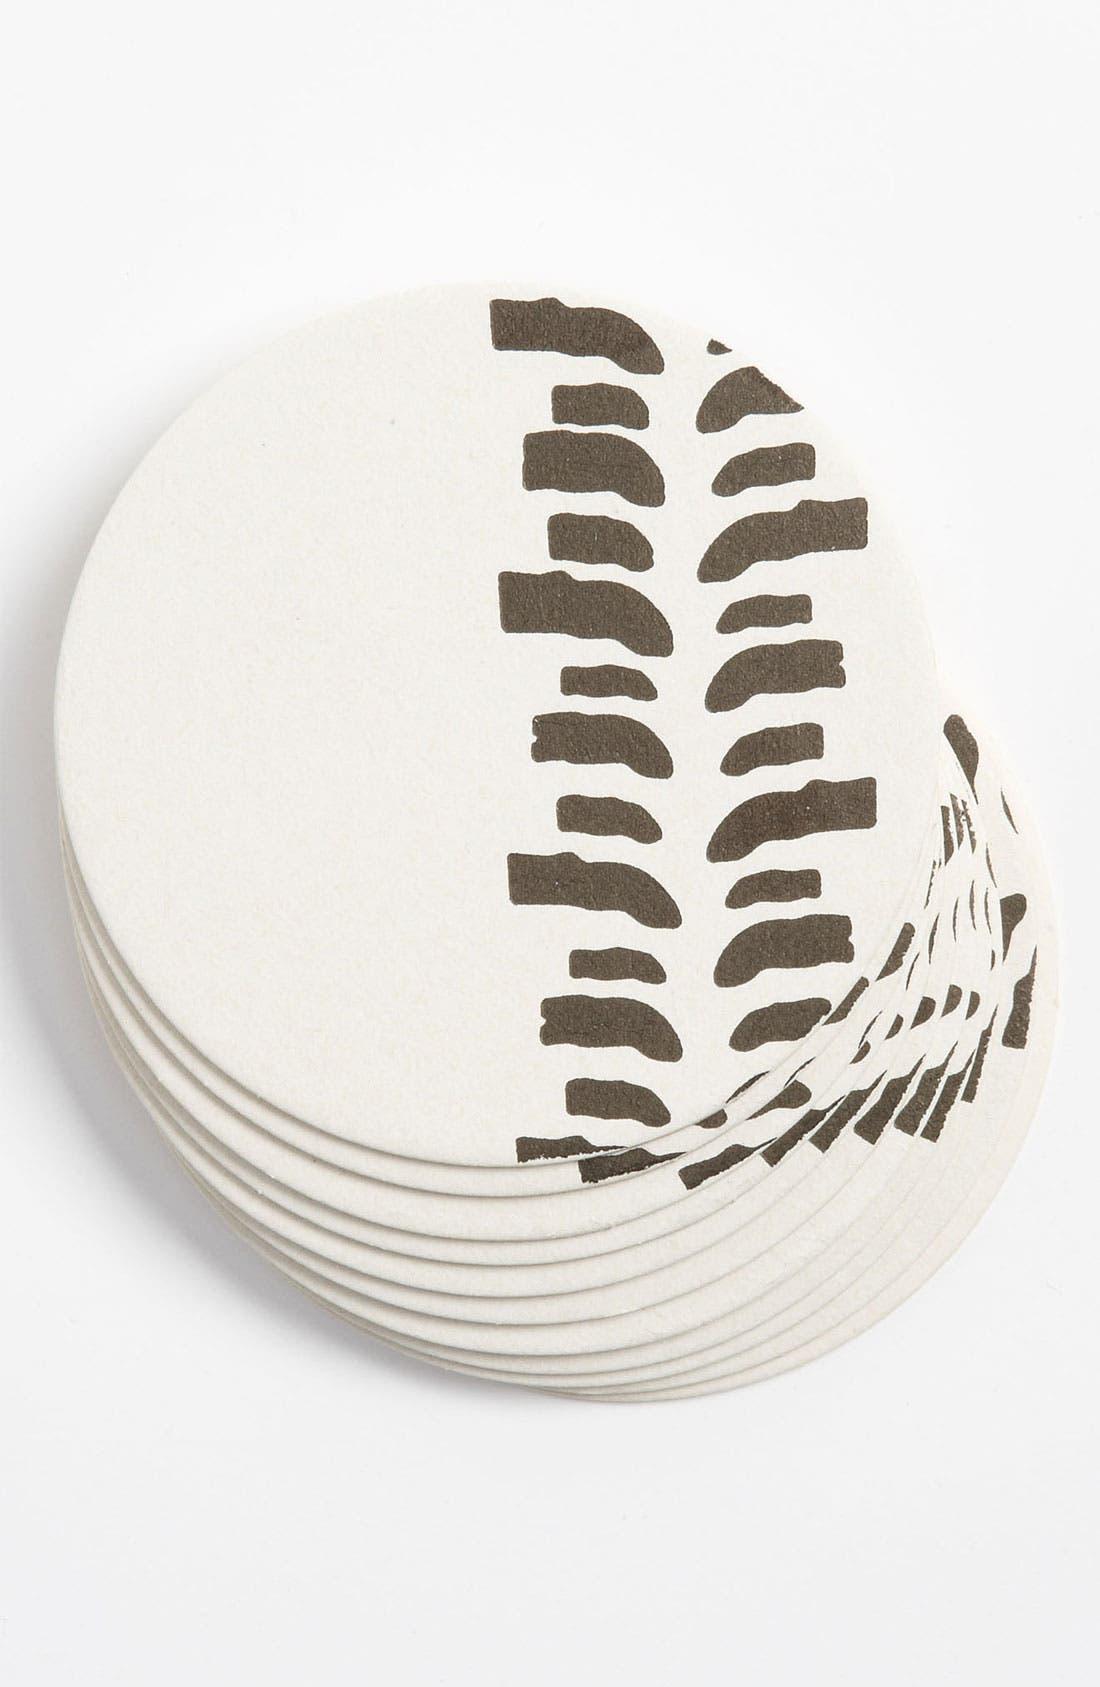 Main Image - 'Truck Tires' Letterpress Coasters (Set of 10)